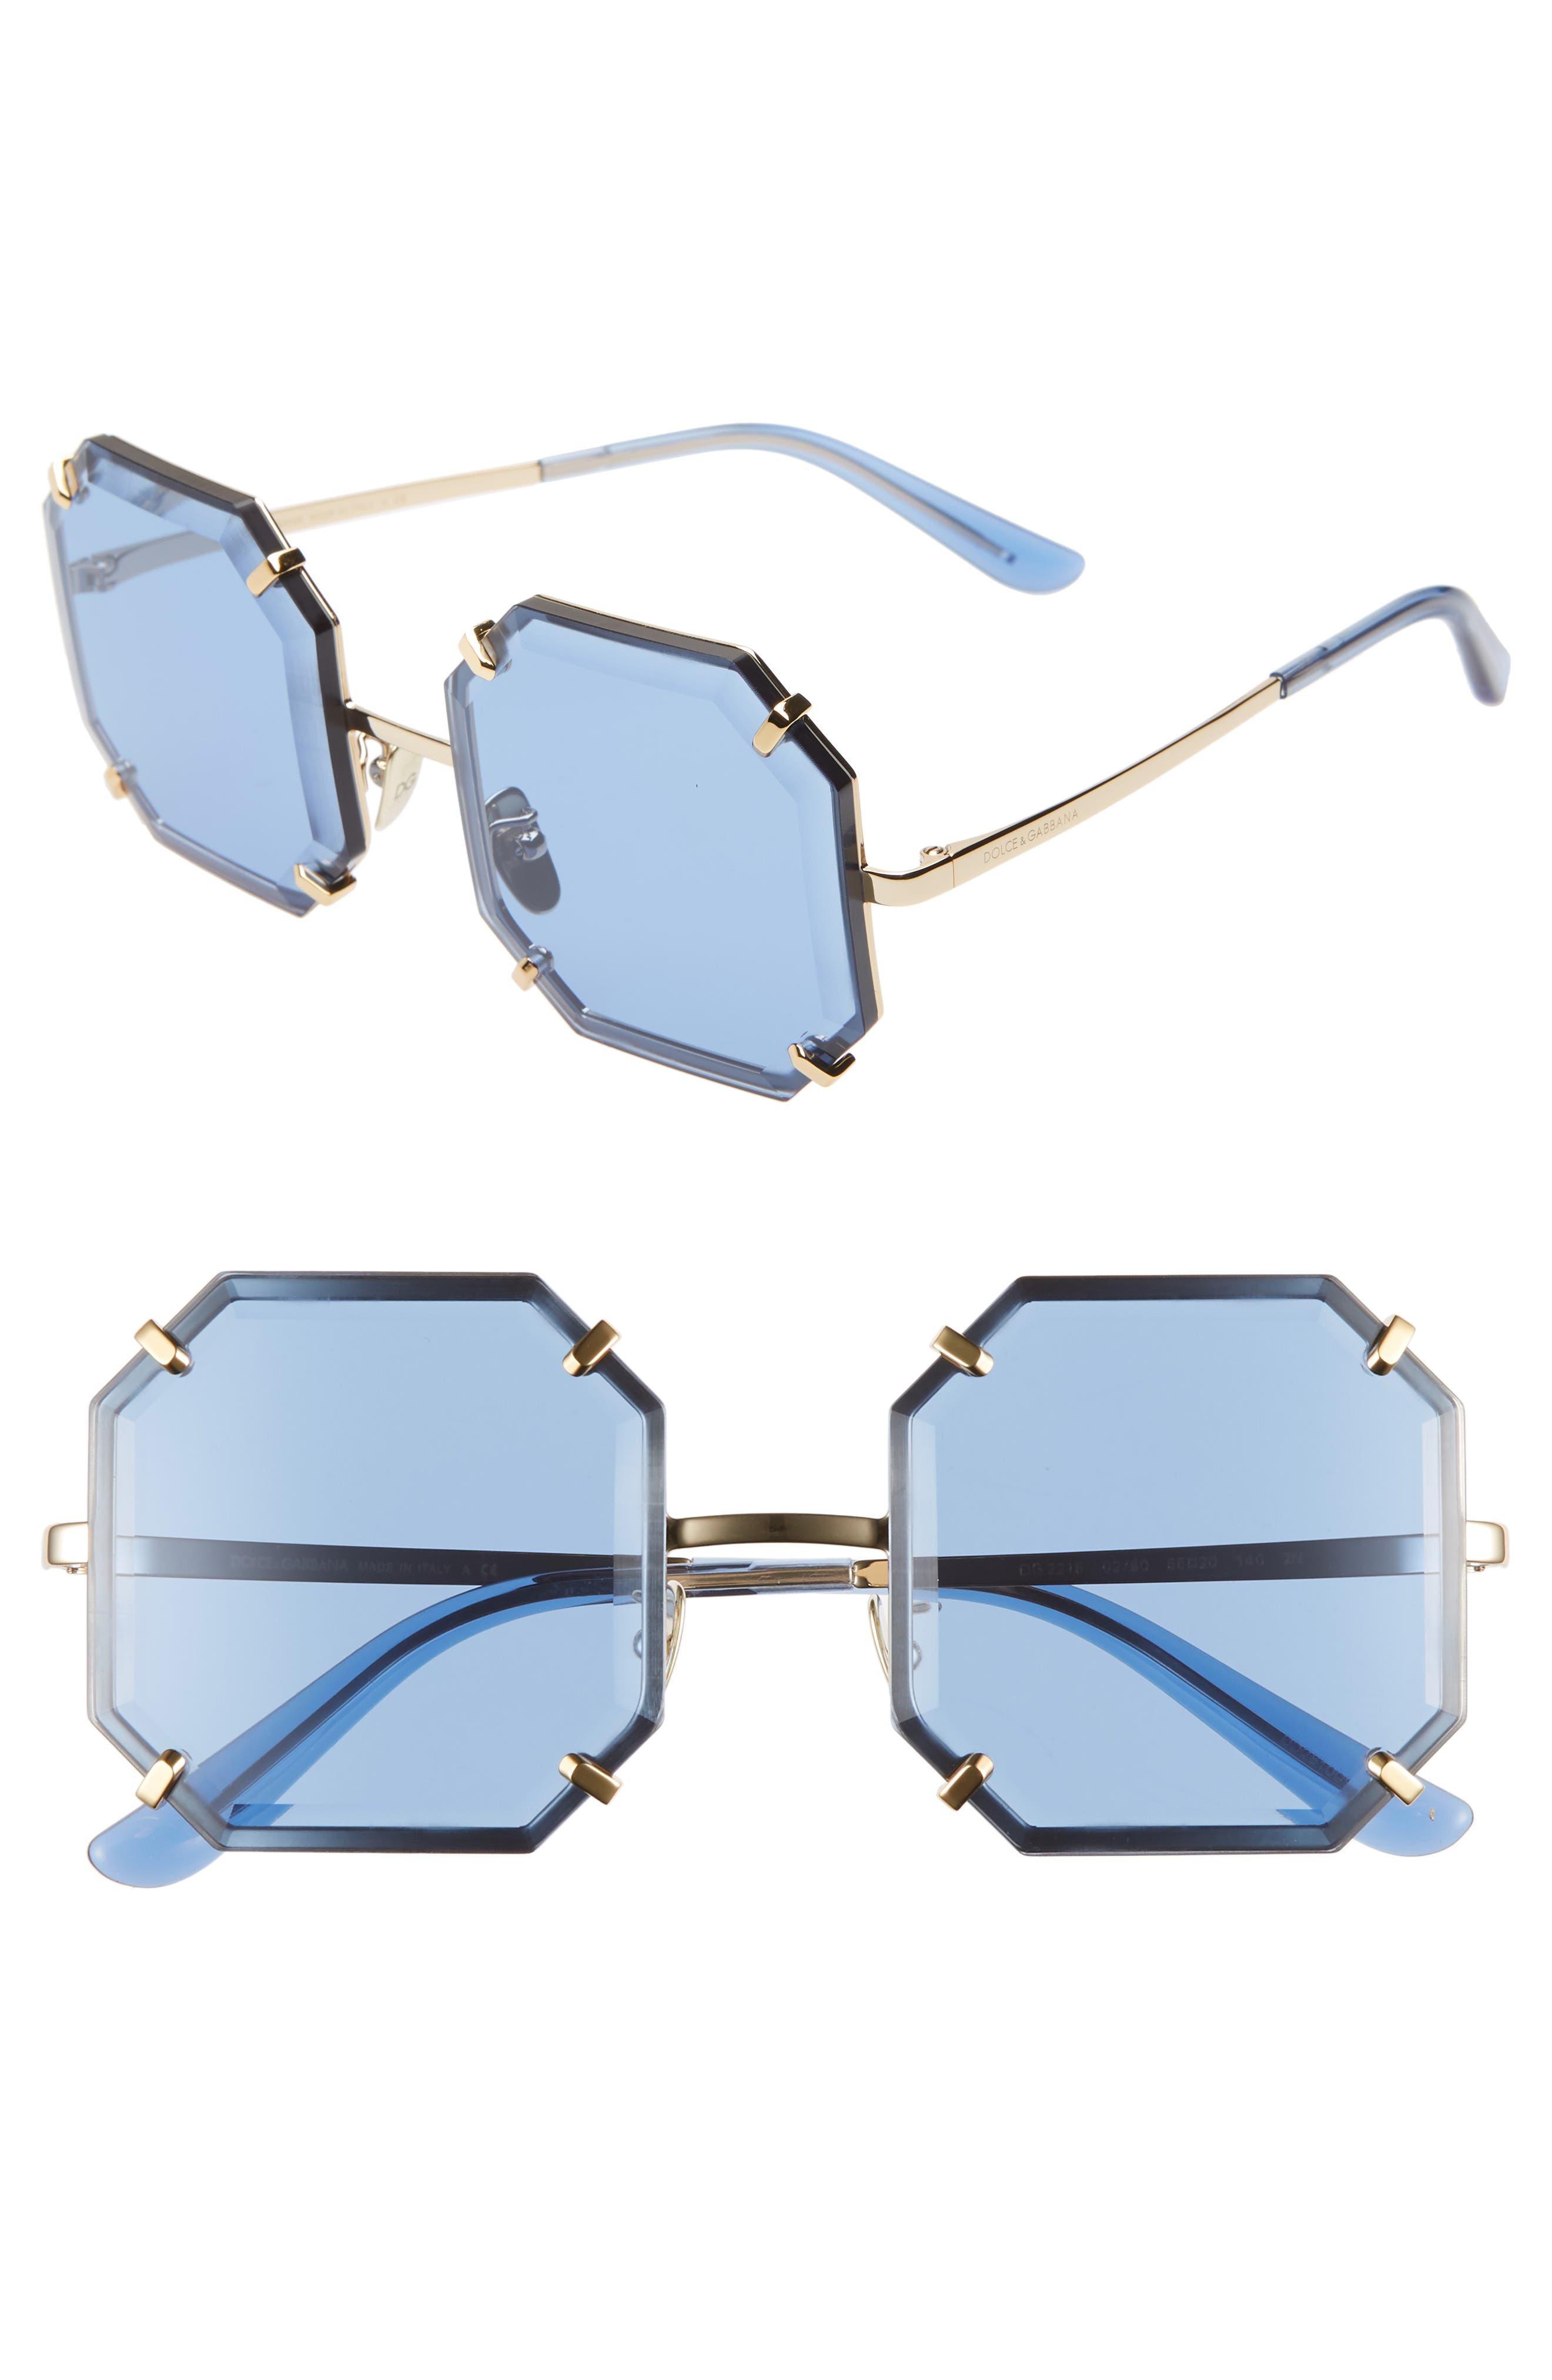 Jewel 55mm Octagonal Sunglasses,                             Main thumbnail 1, color,                             SILVER/ BLUE SOLID